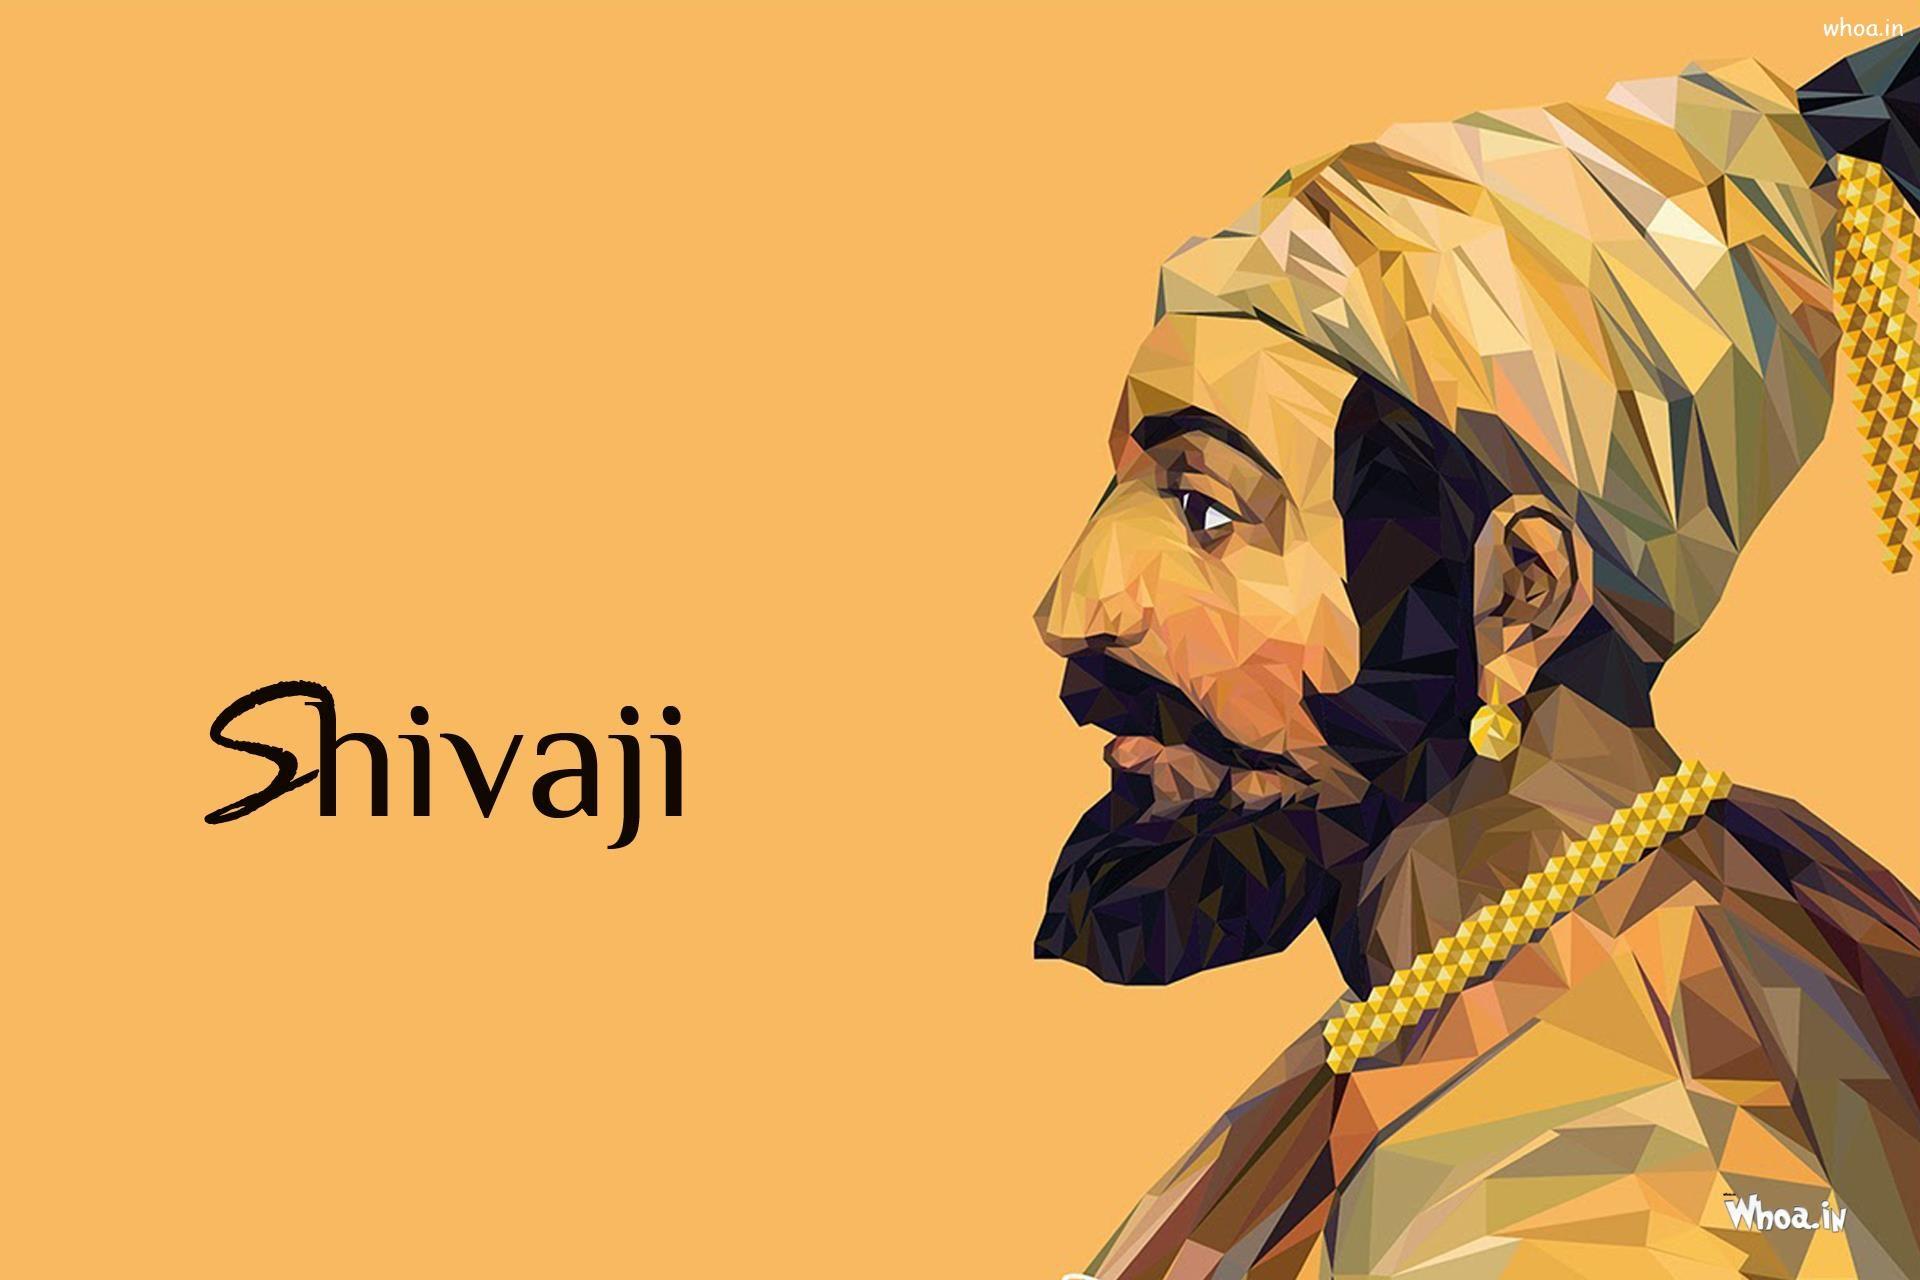 Shivaji Maharaj Hand Painting HD Wallpaper